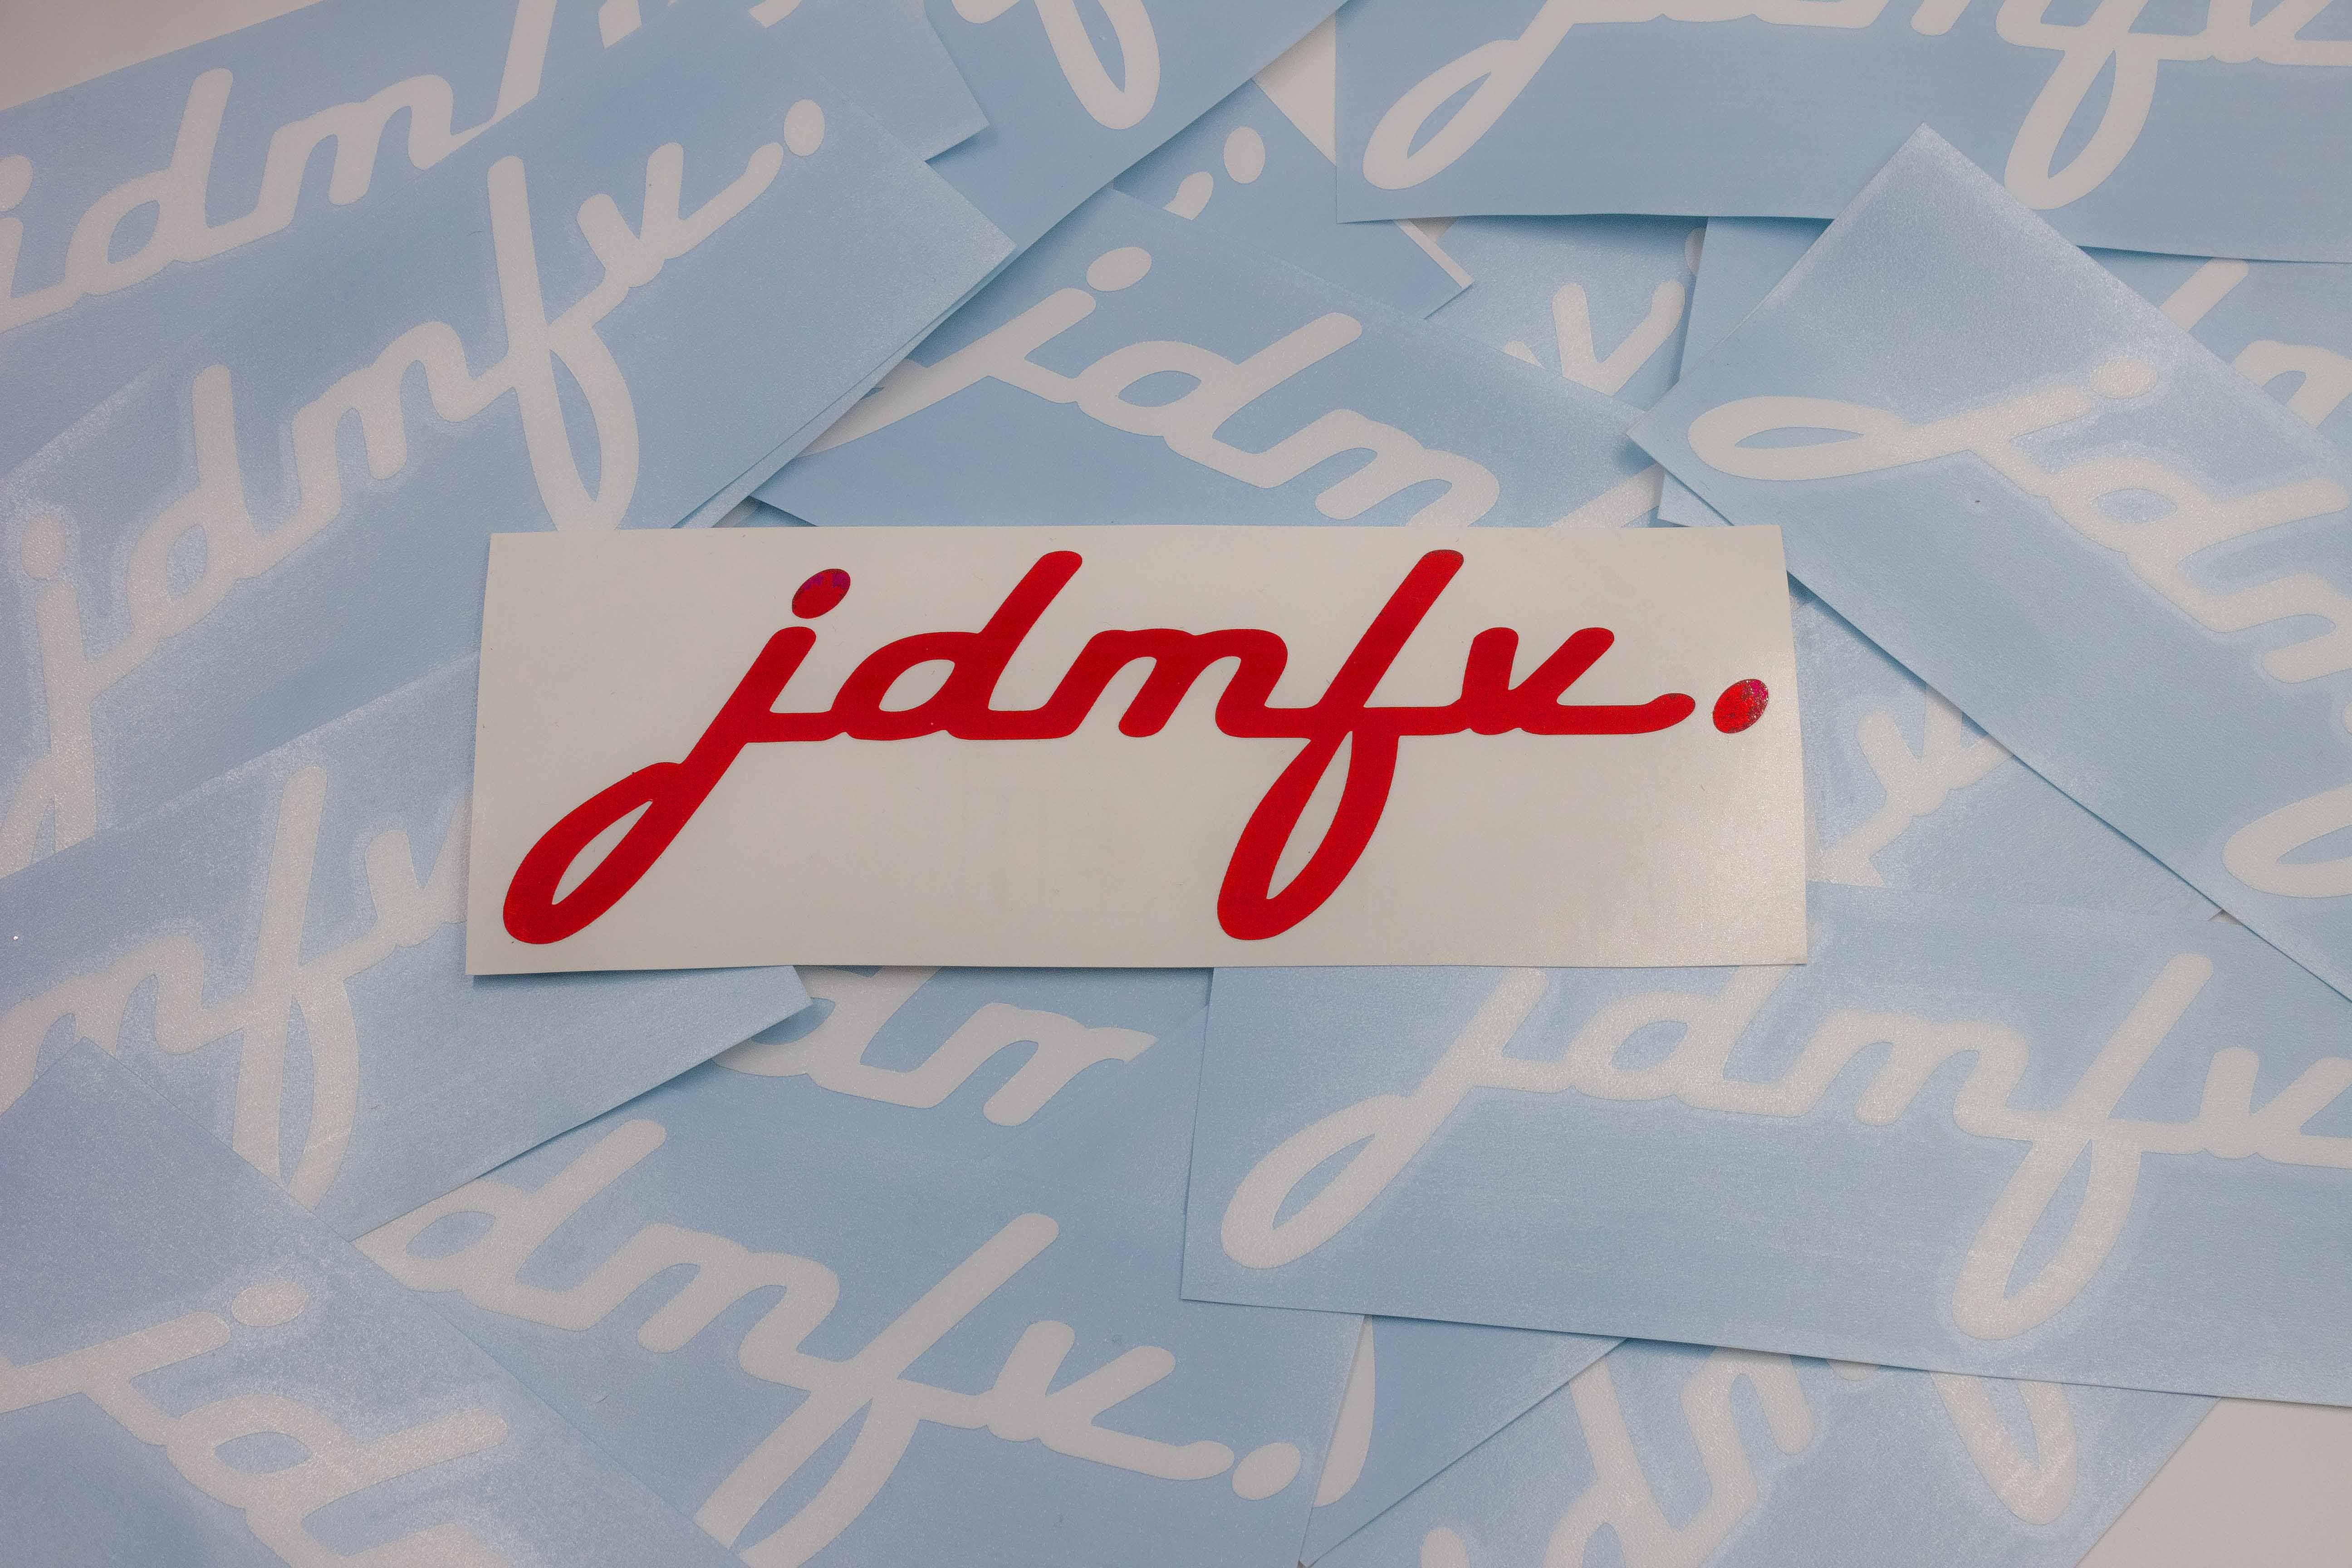 jdmfv-sign.jpg